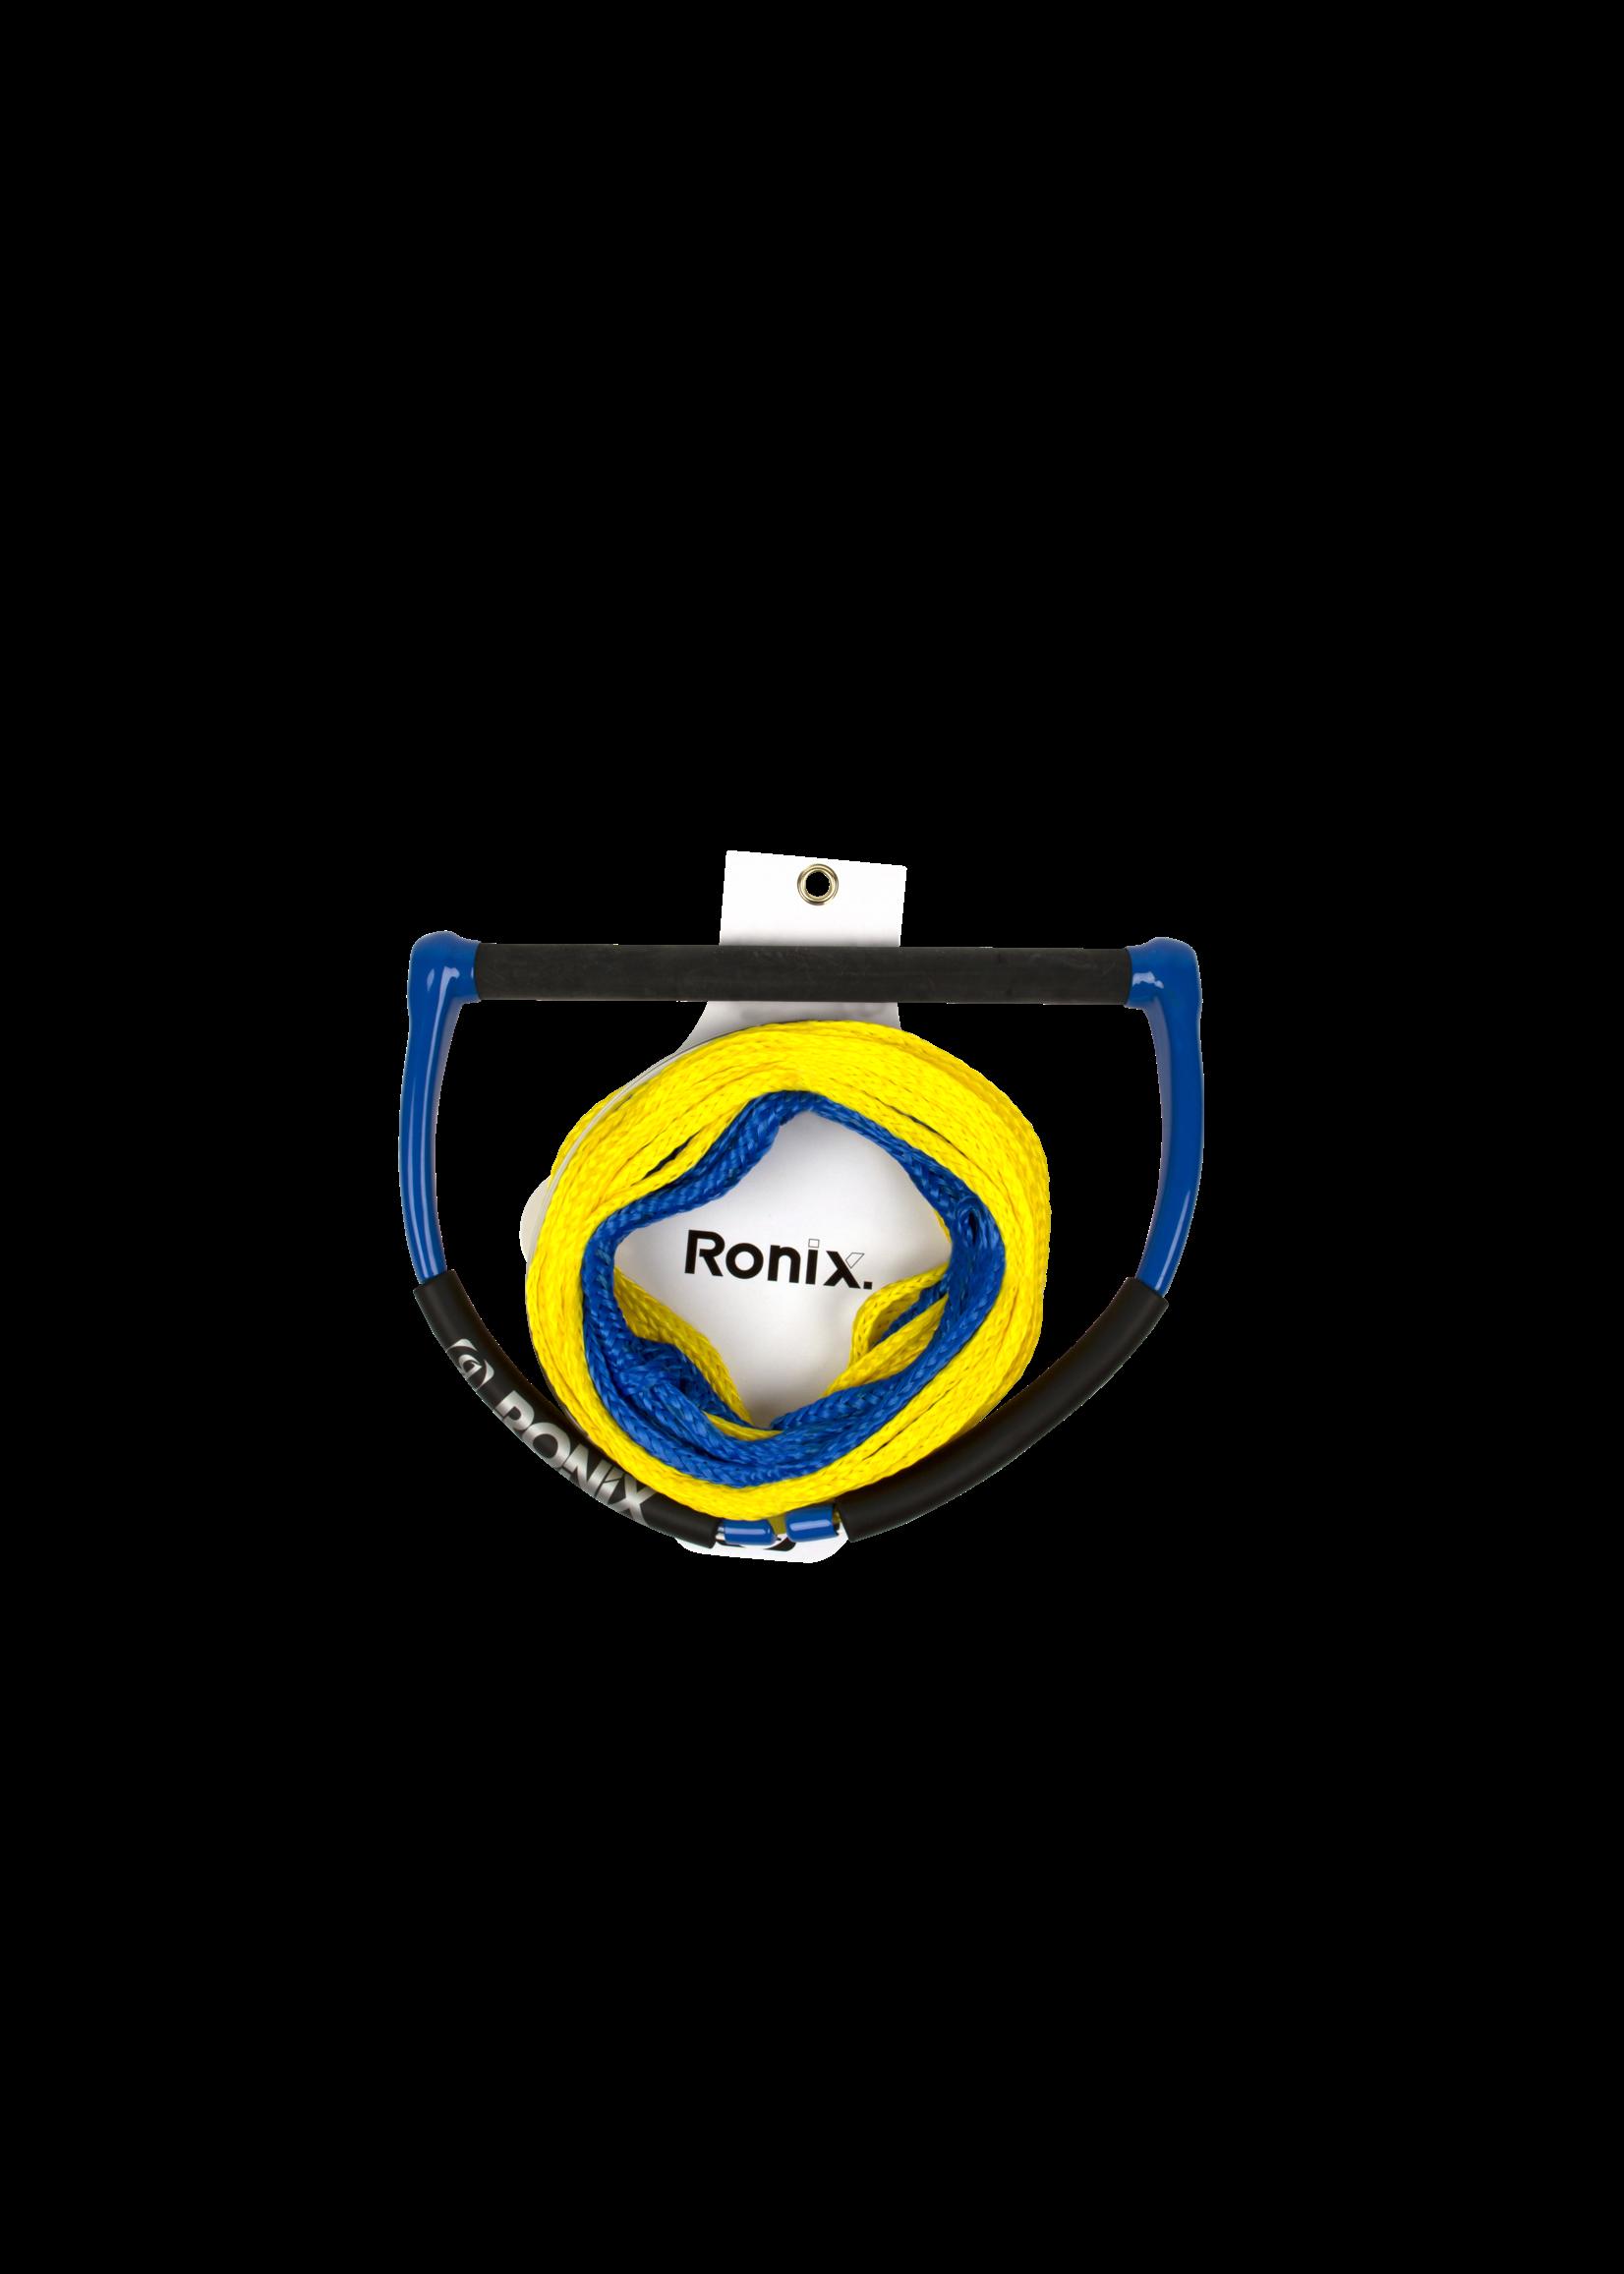 Ronix COMBO 1.0